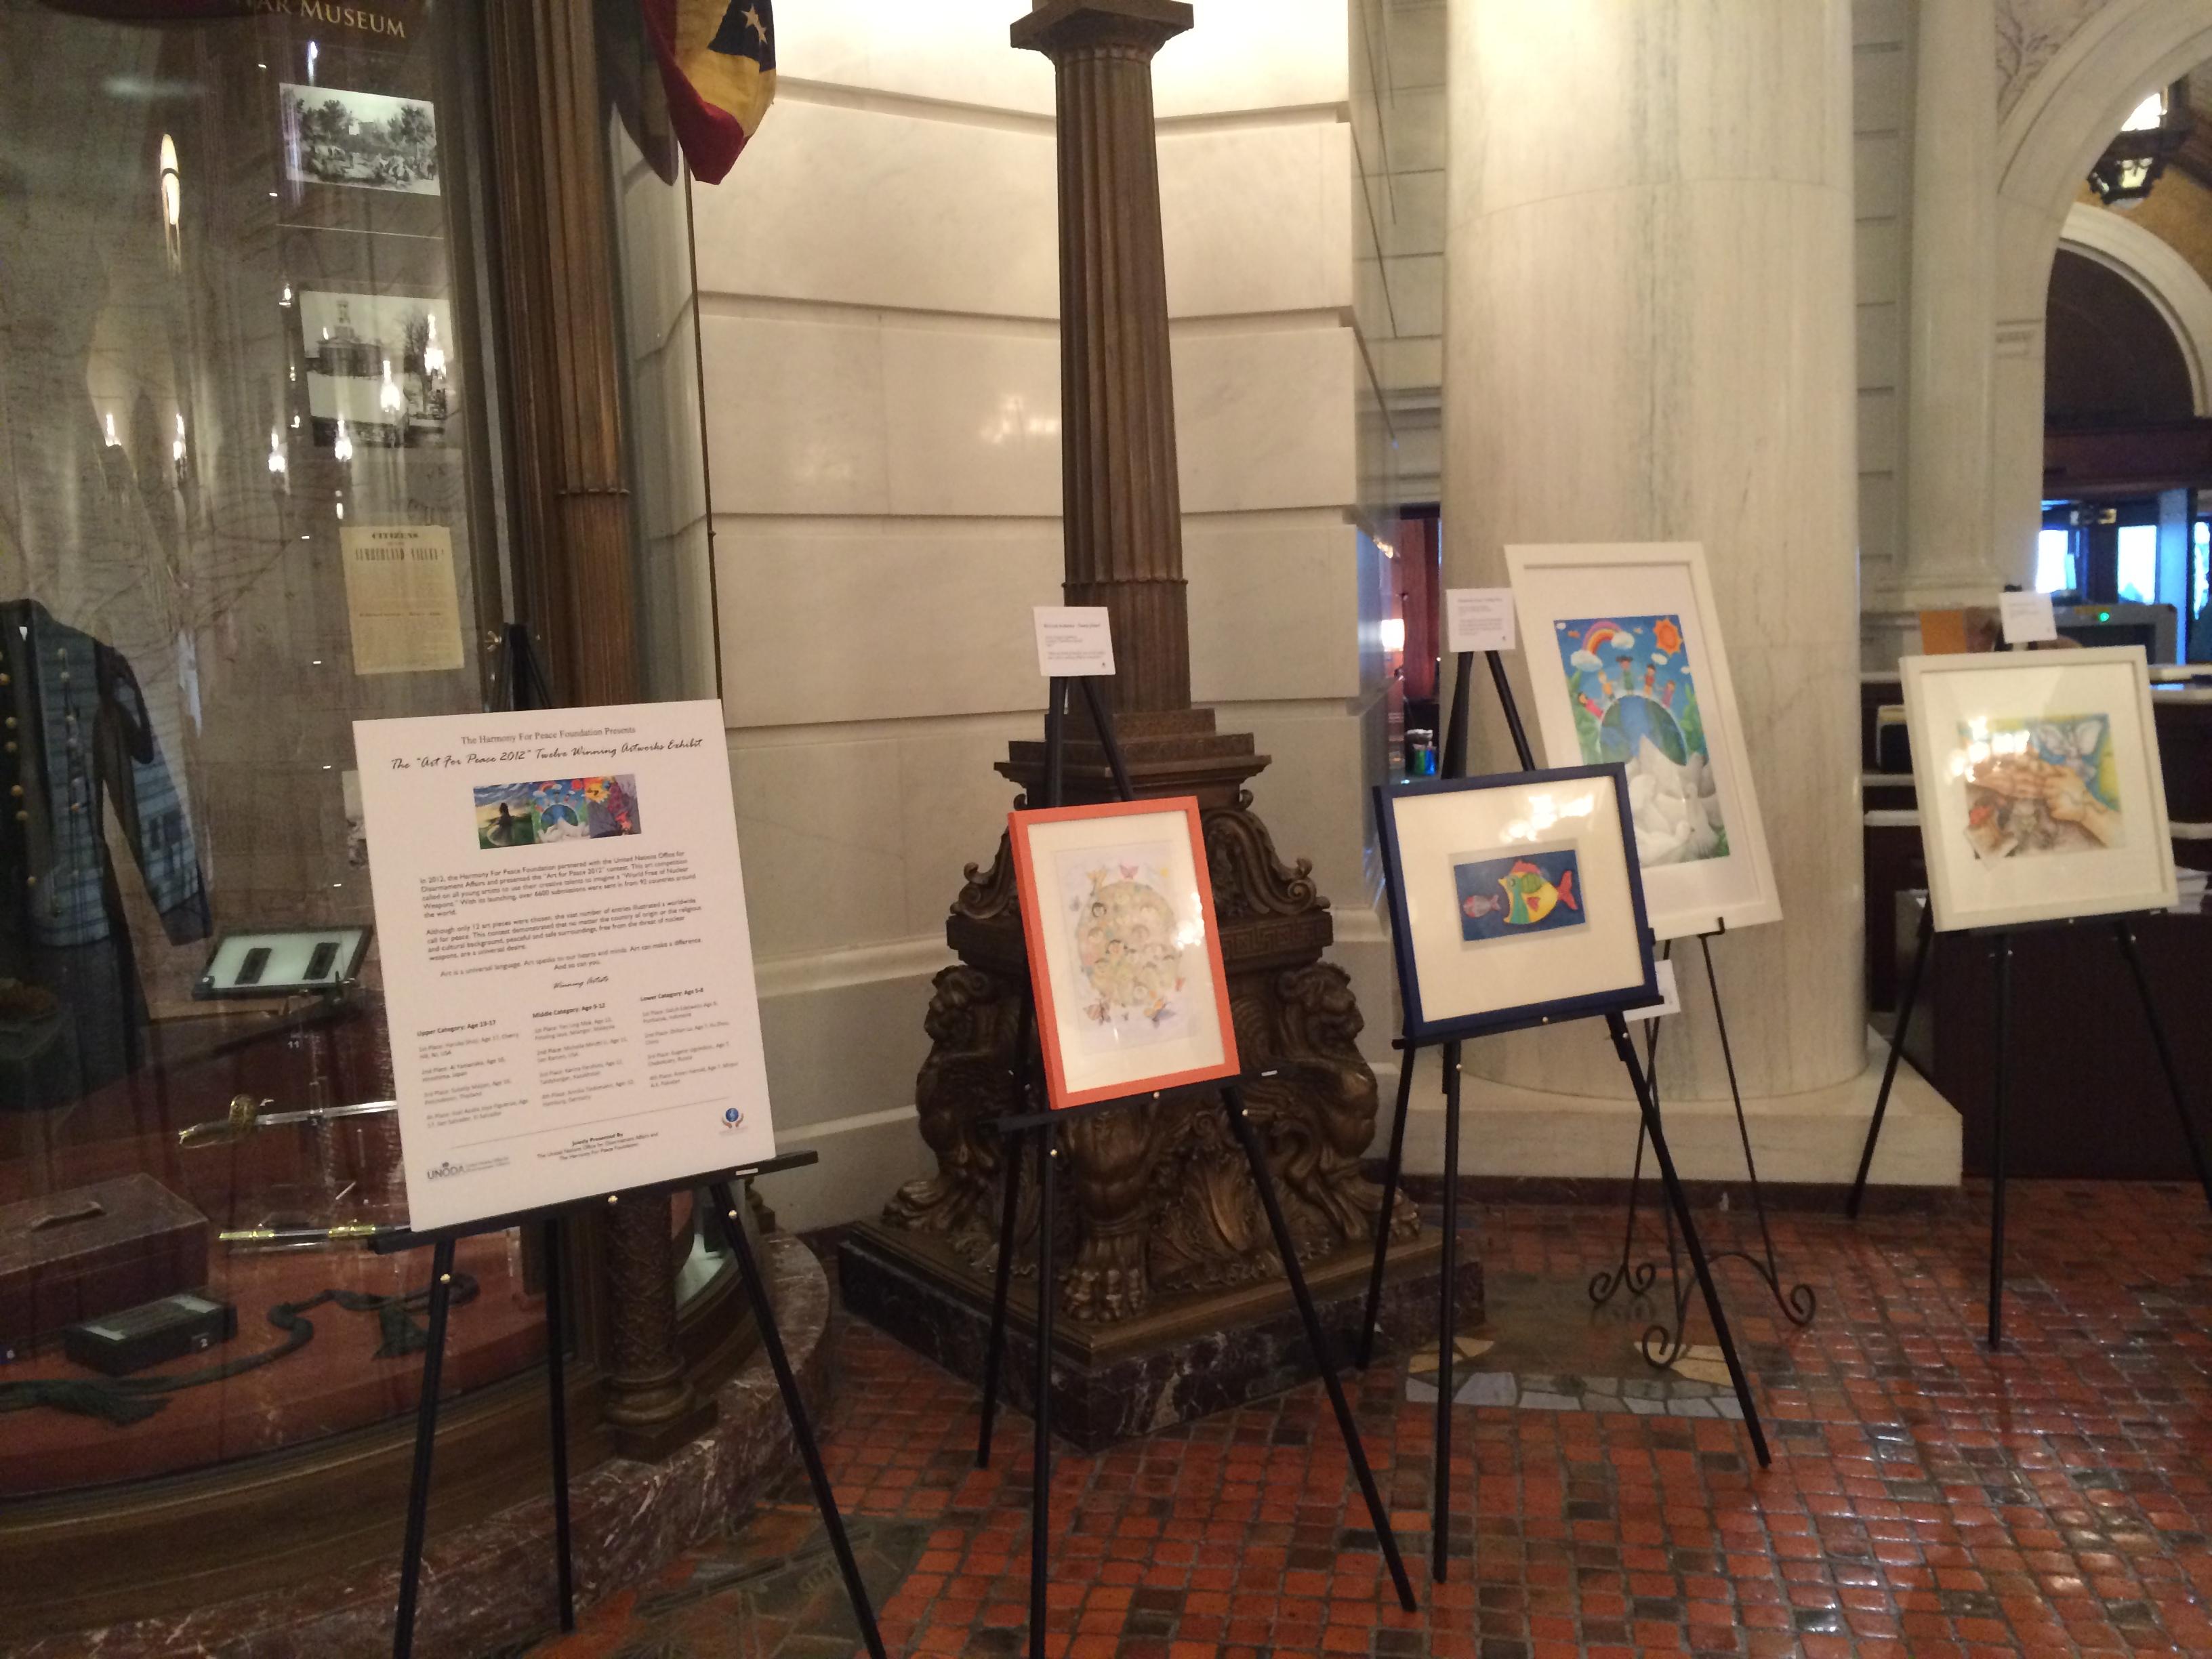 Artwork Displayed in Harrisburg